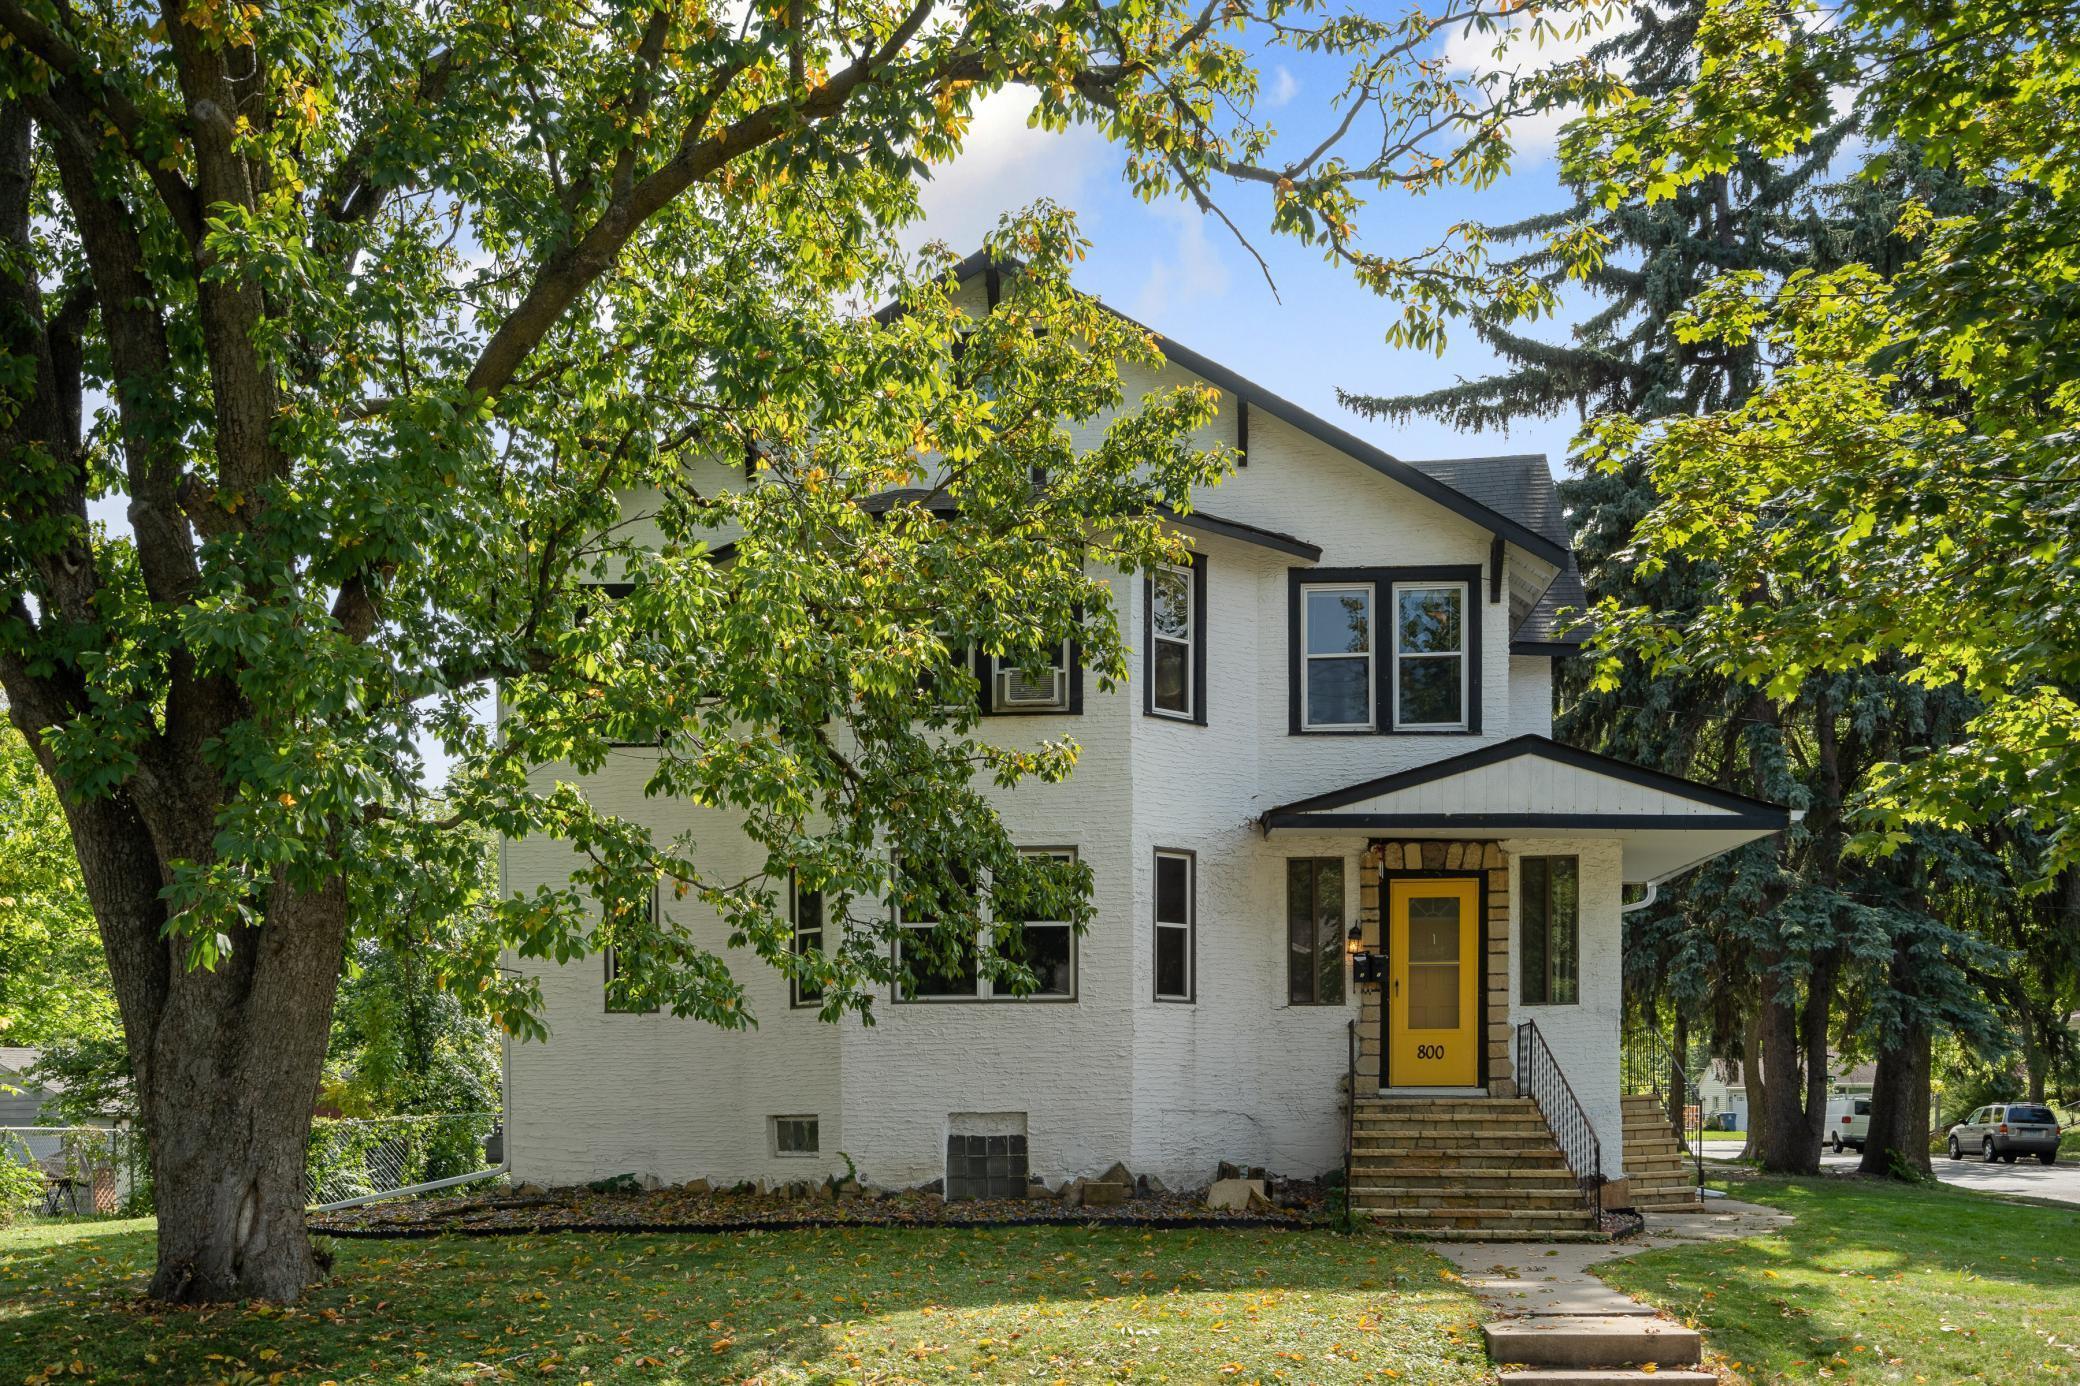 800 37th Avenue NE Property Photo - Minneapolis, MN real estate listing